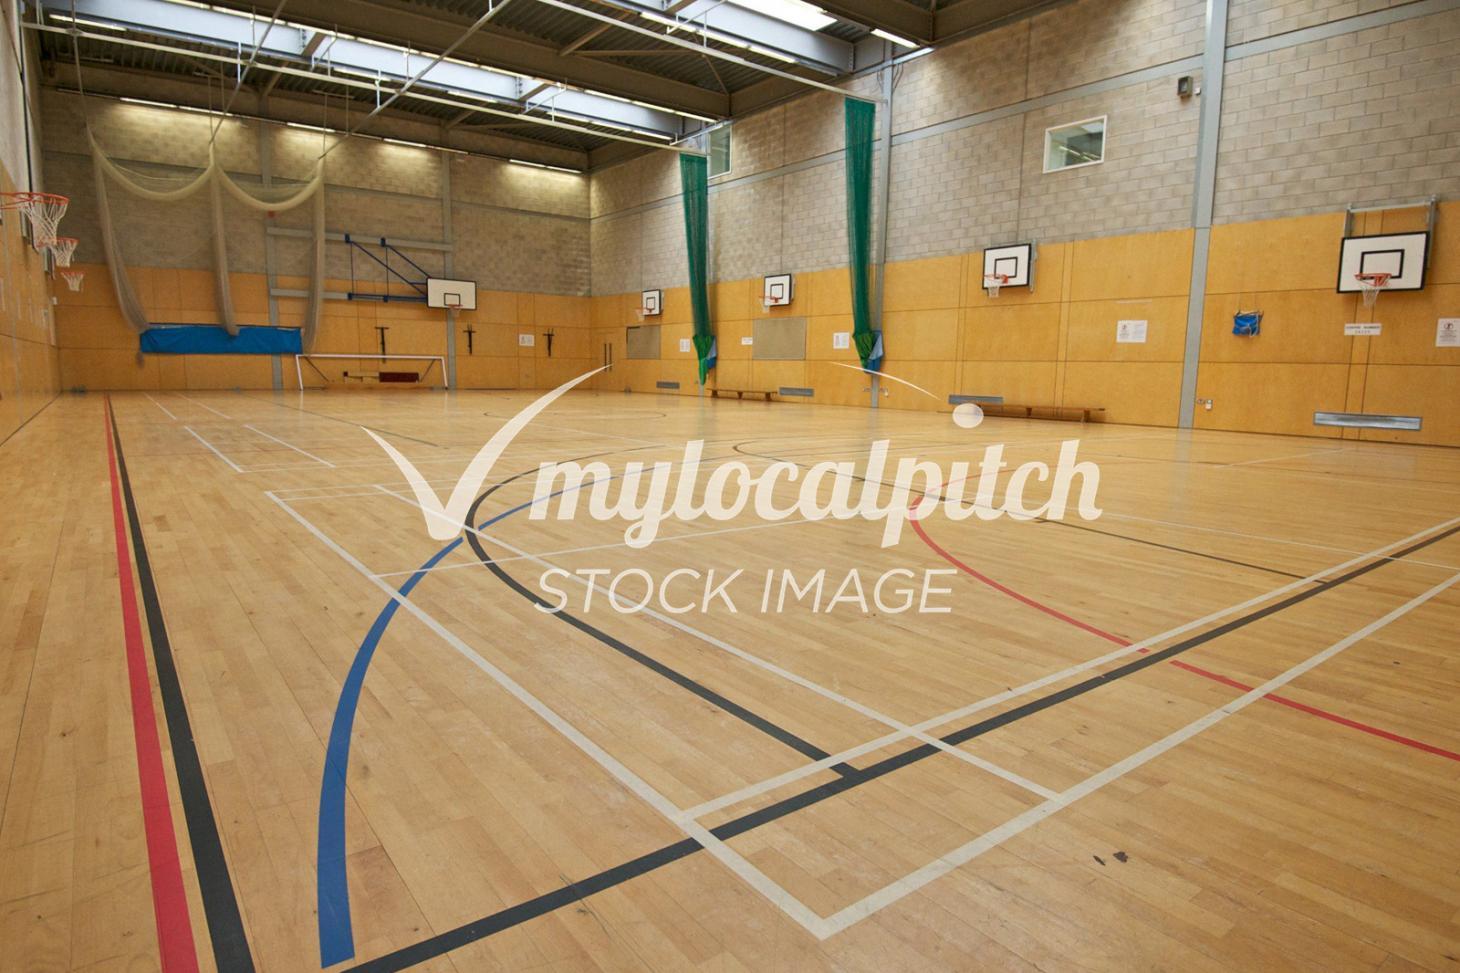 Watford Grammar School for Boys Indoor basketball court